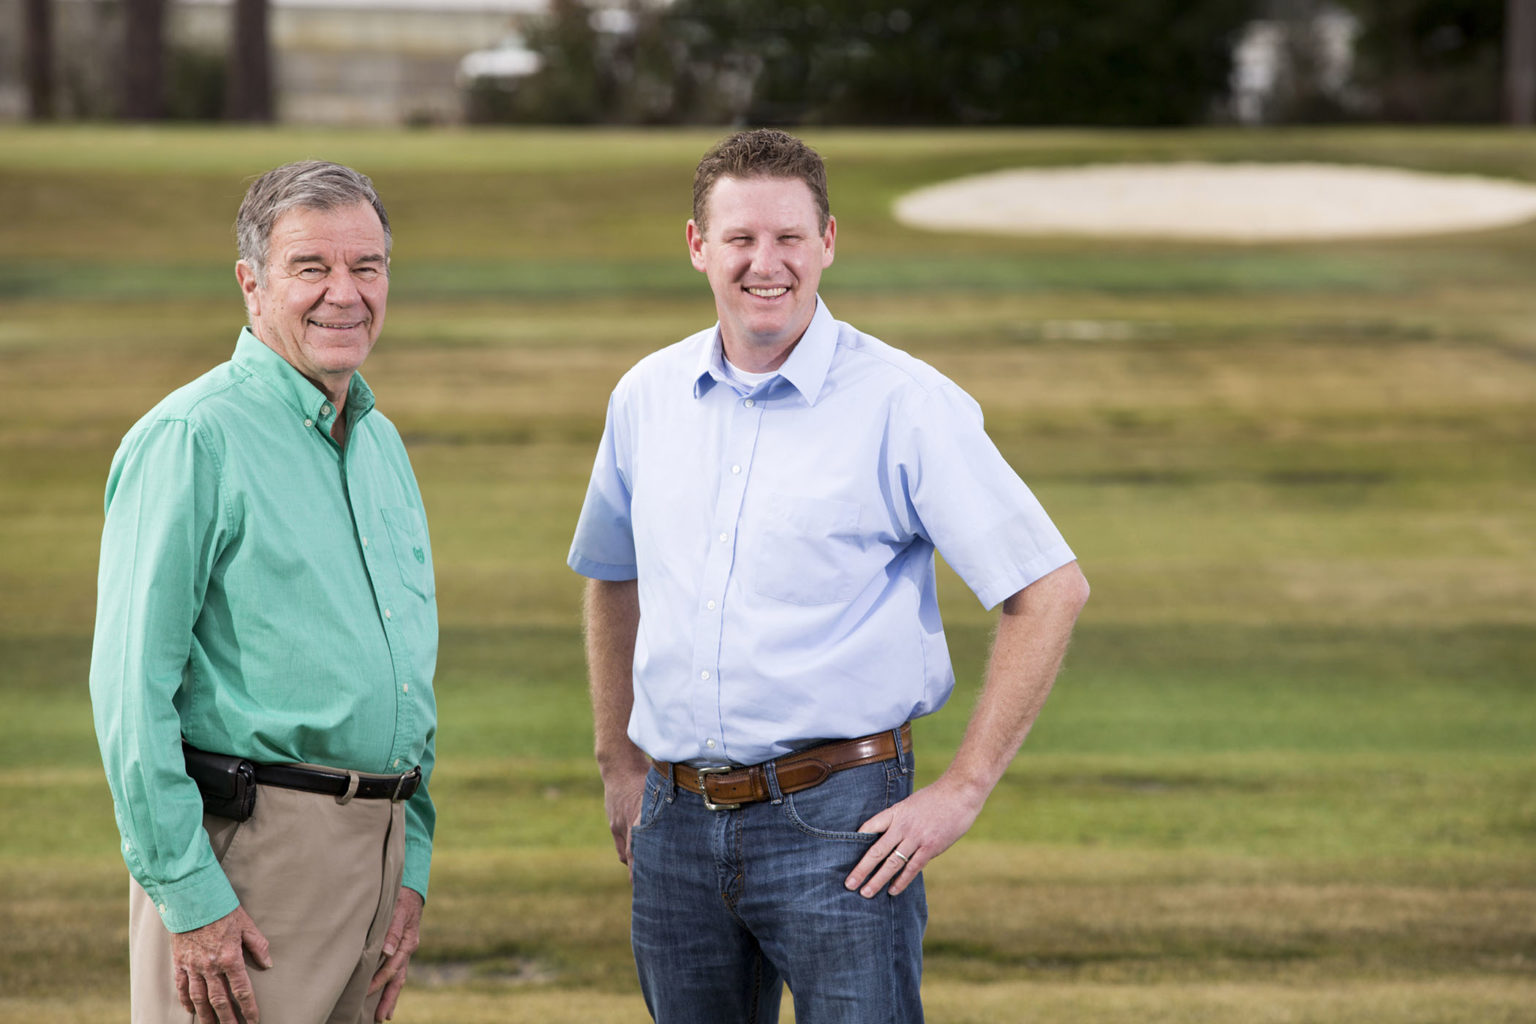 Wayne Hanna, left, and Brian Schwartz in a turfgrass research field at UGA-Tifton. (UGA photo taken by Dorothy Kozlowski/UGA in 2017)